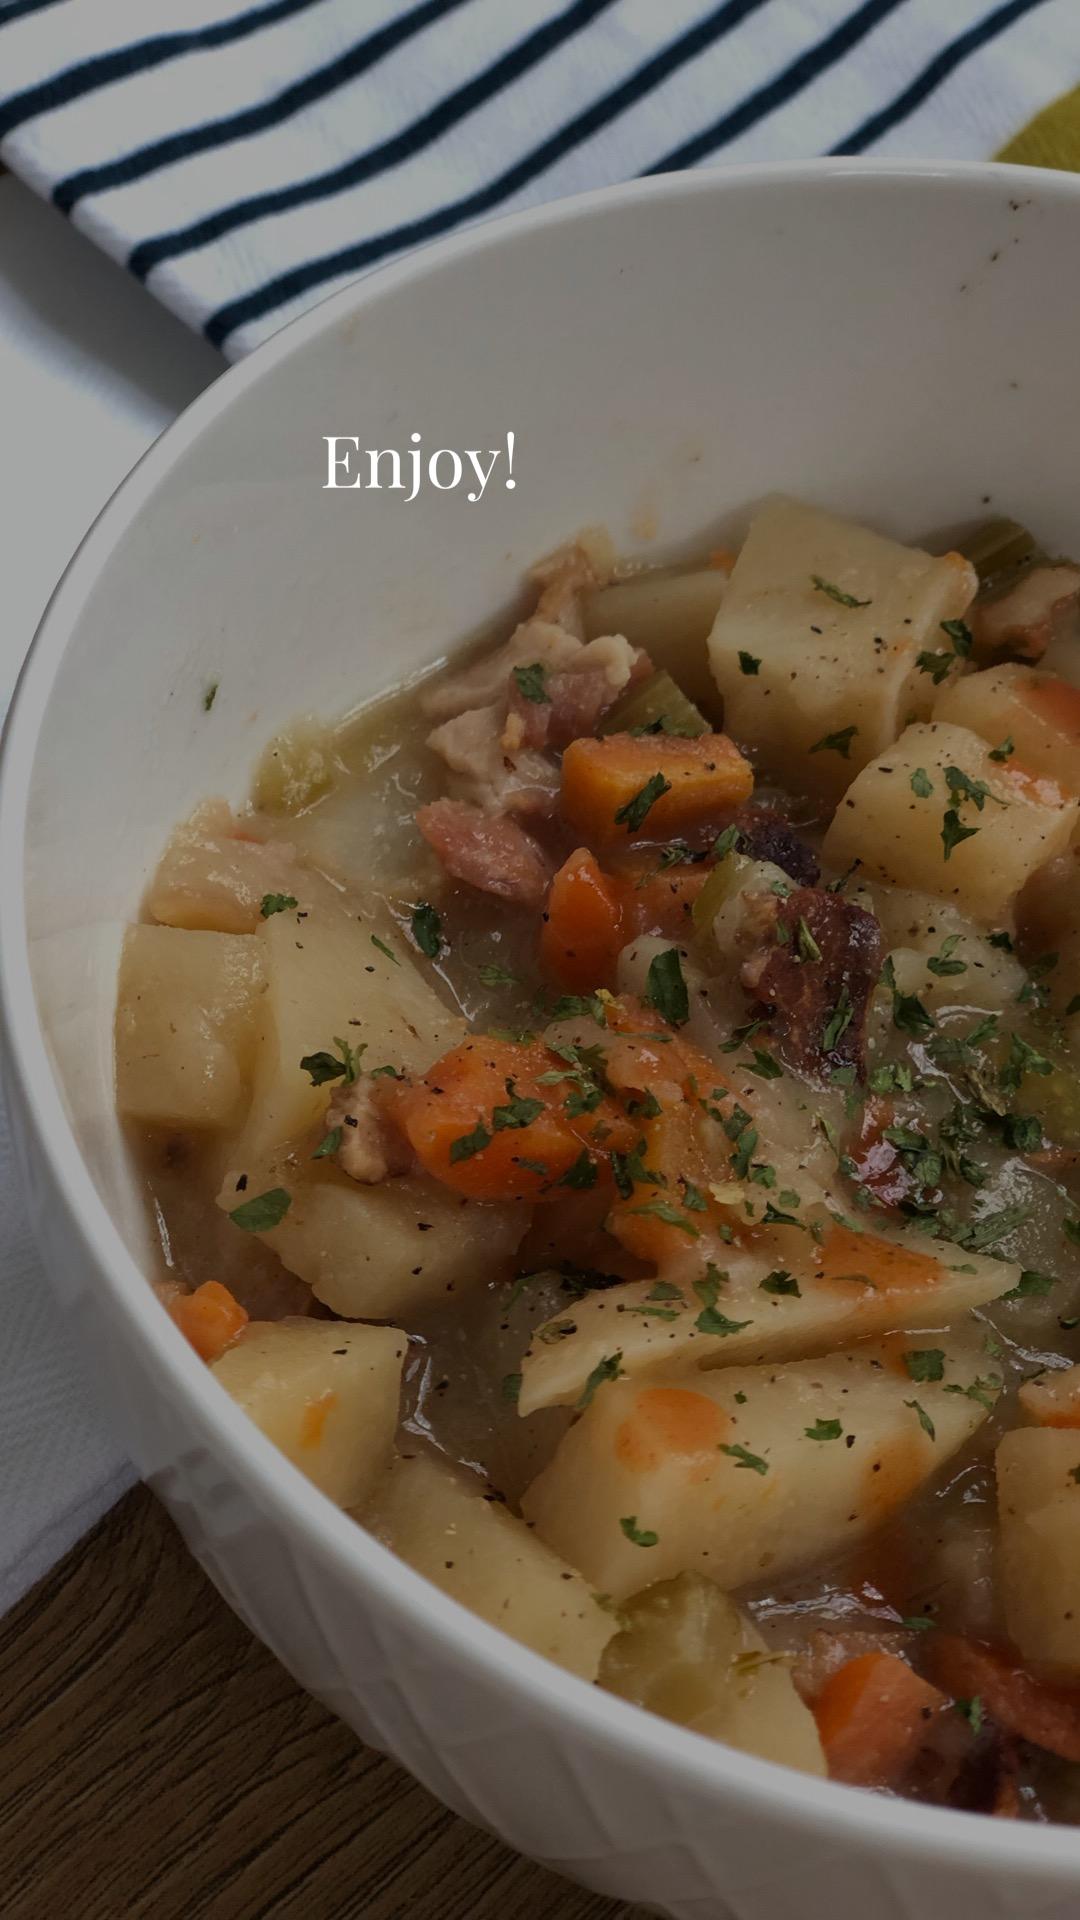 Potatos, carrots, bacon, parsley, celery soup in a bowl